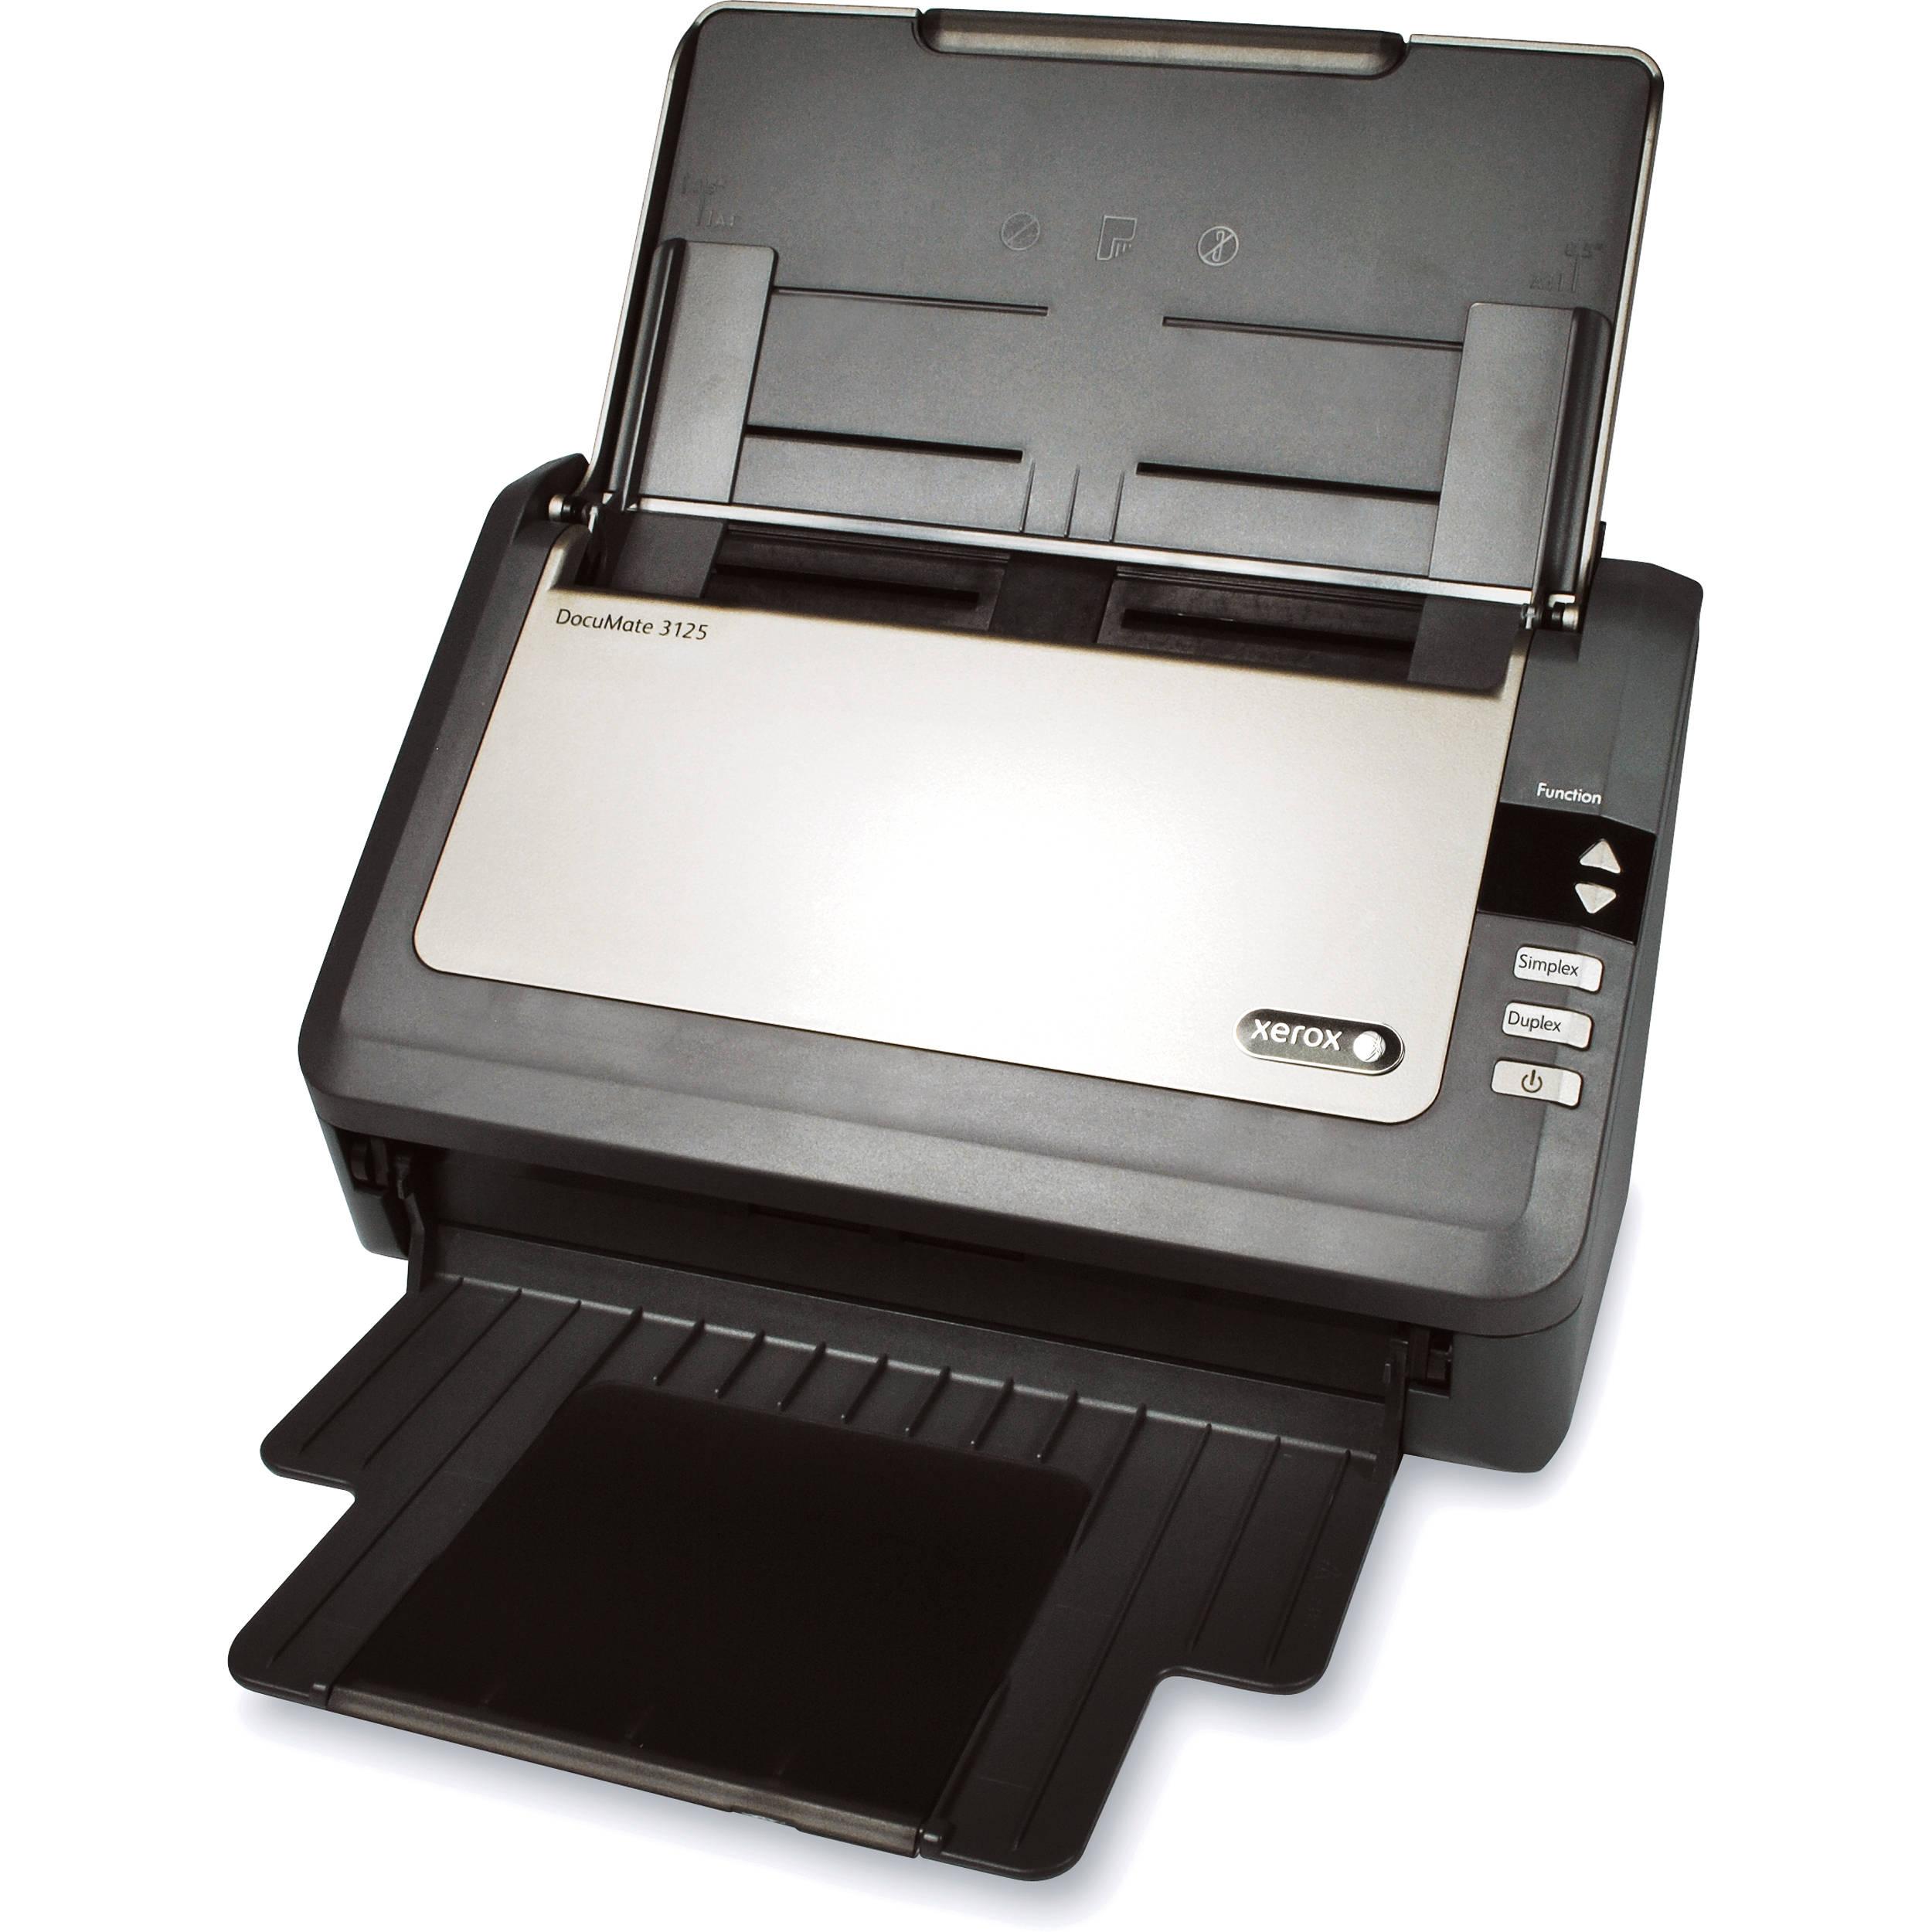 Xerox DocuMate 3125 Document Scanner